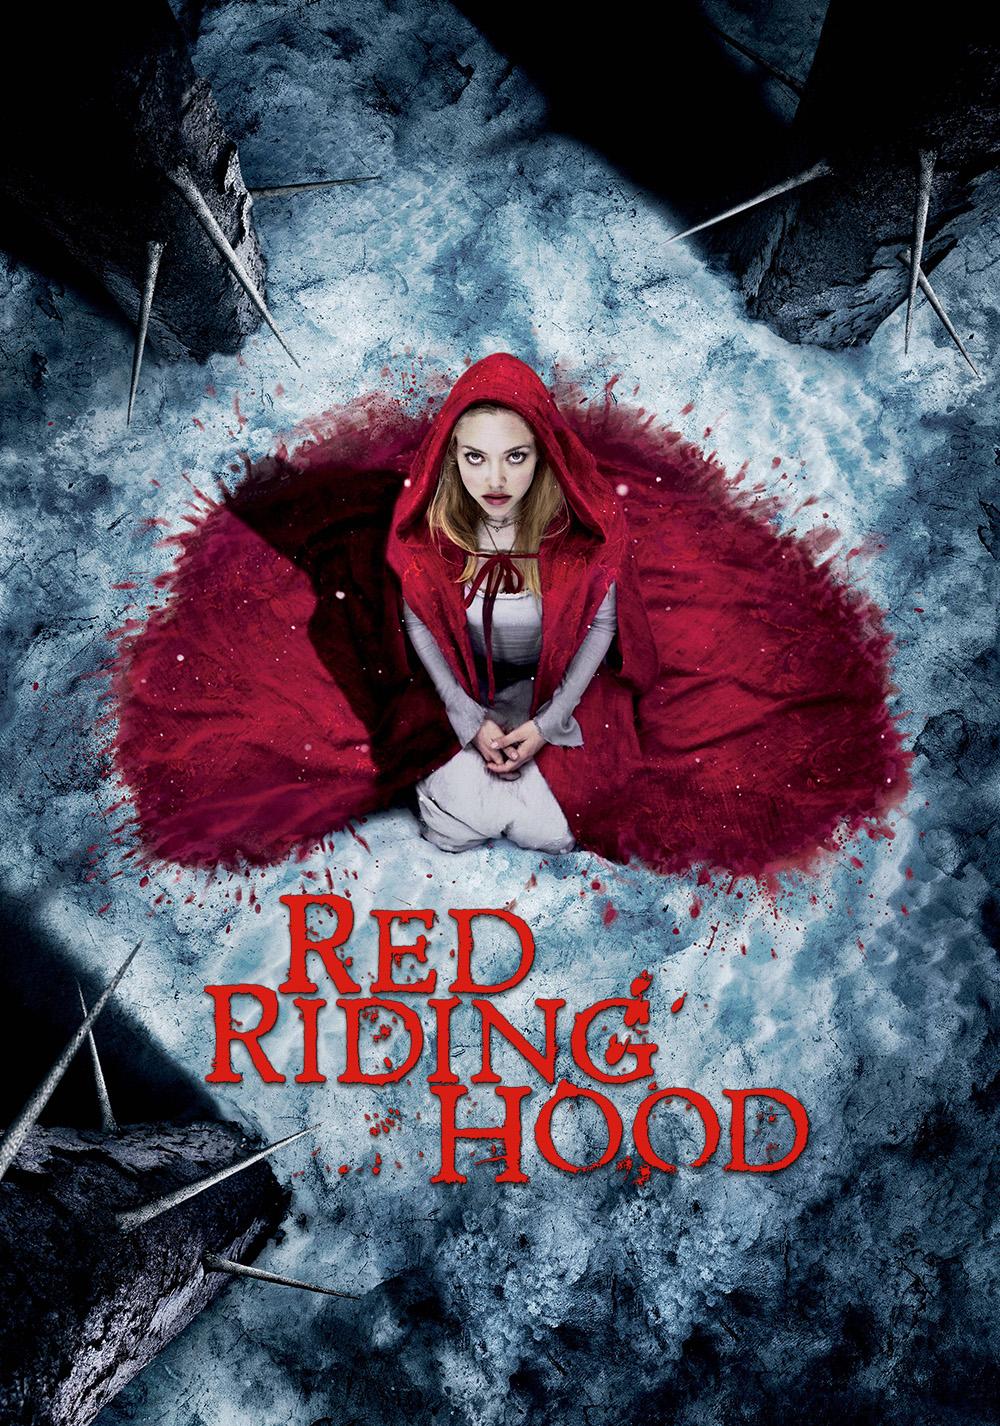 Red Riding Hodd